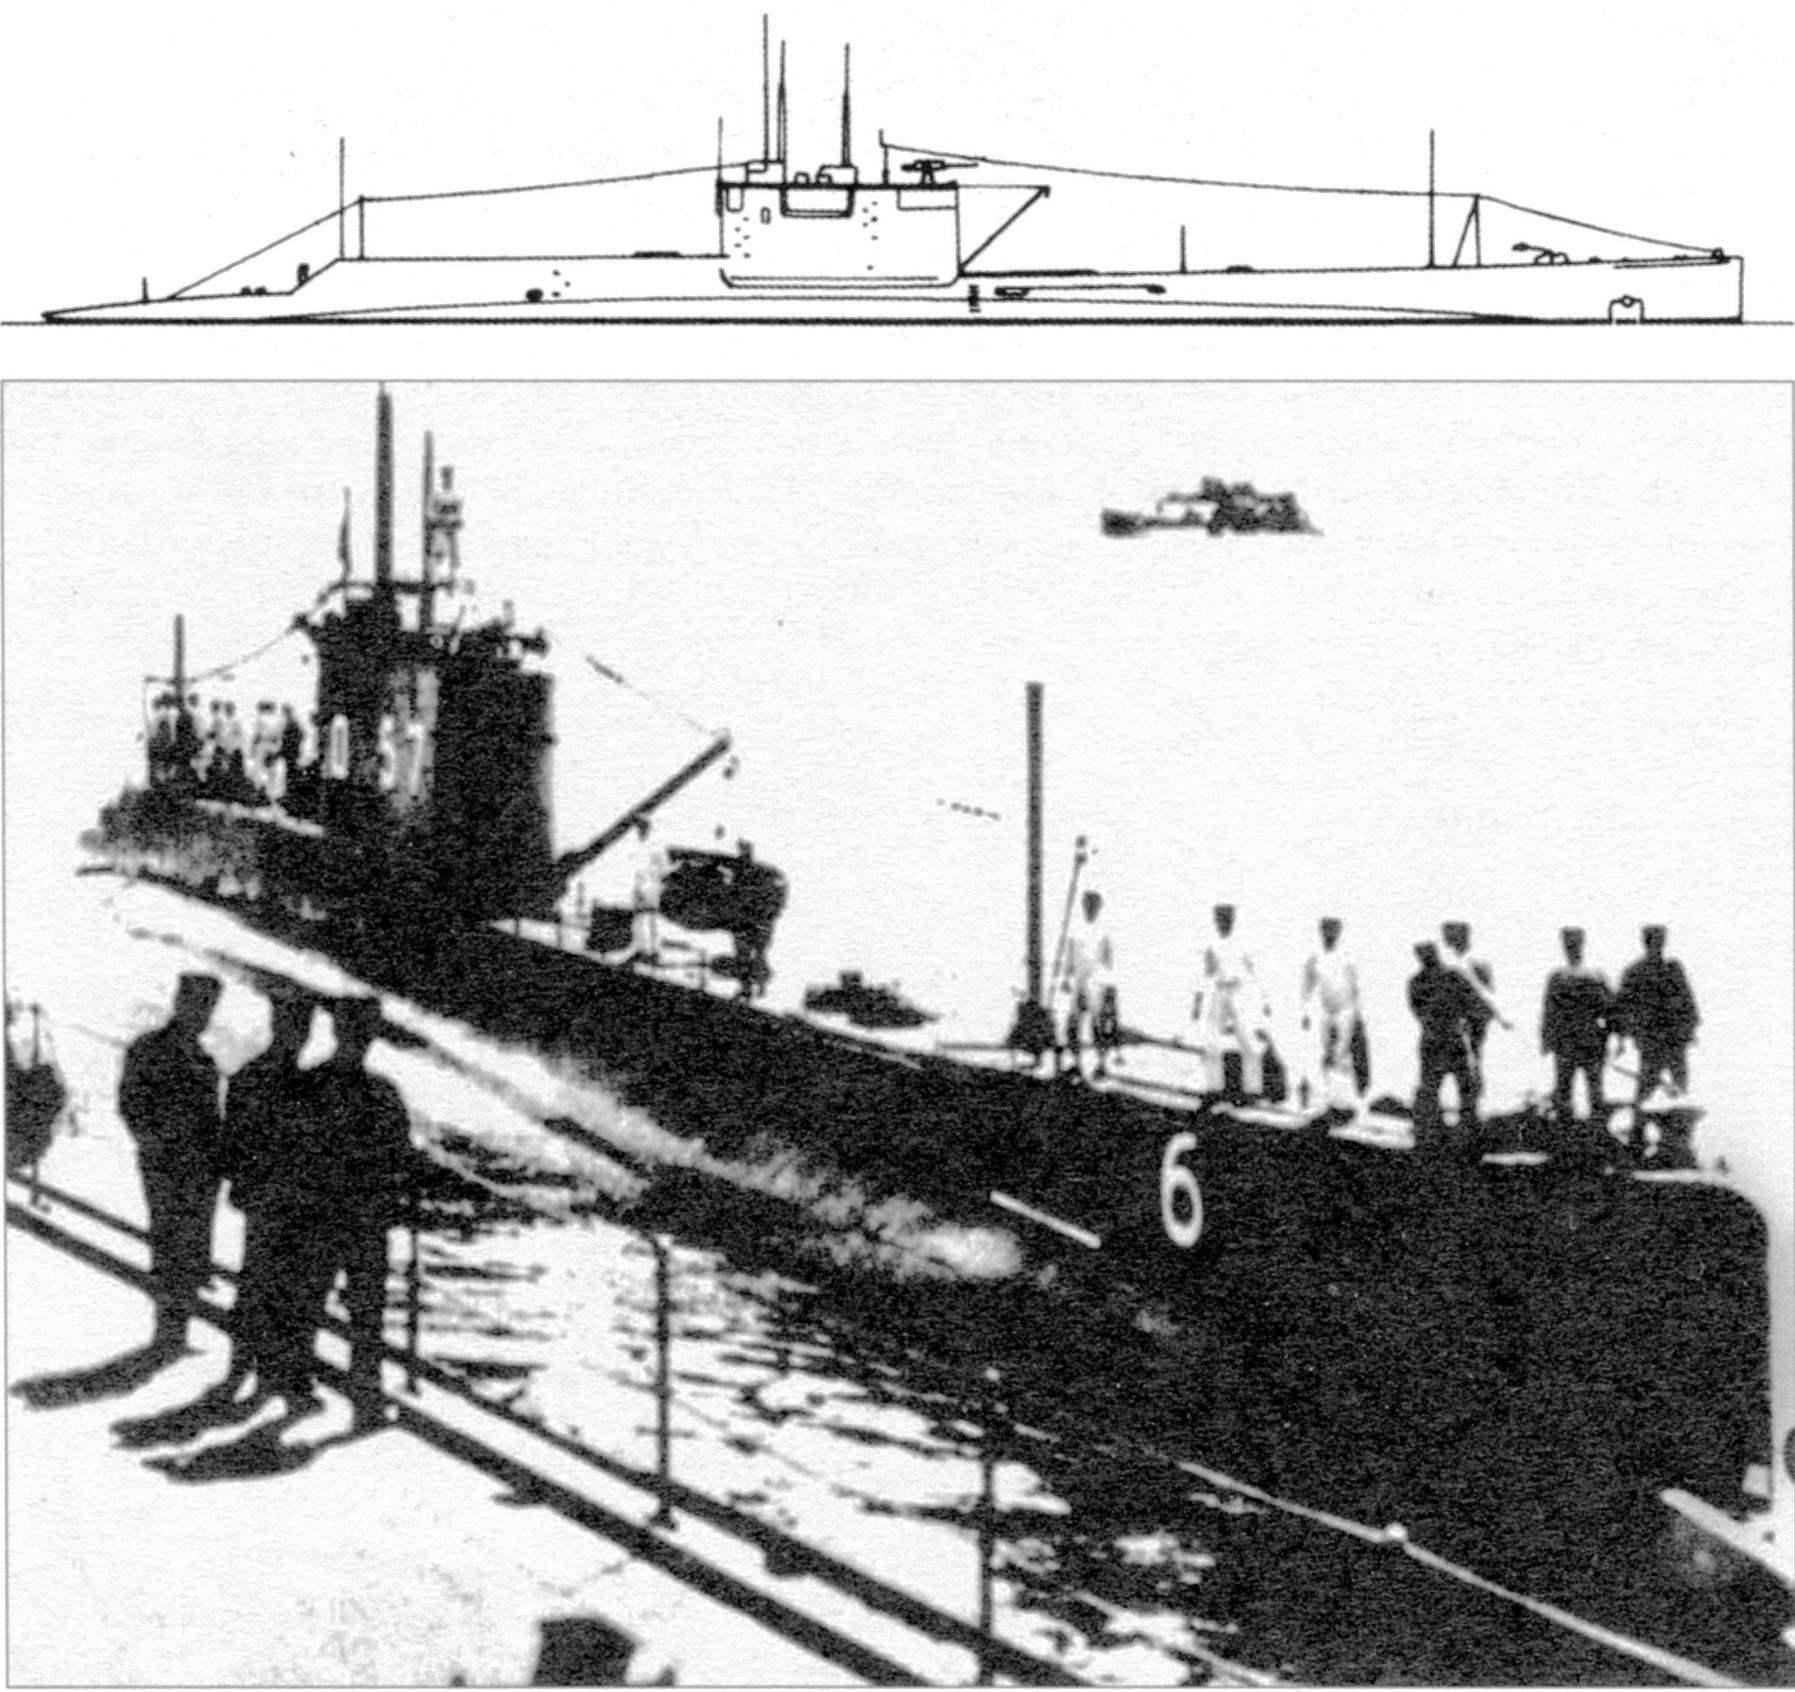 Подводная лодка №46 типа «L-3», Япония, 1922 г.